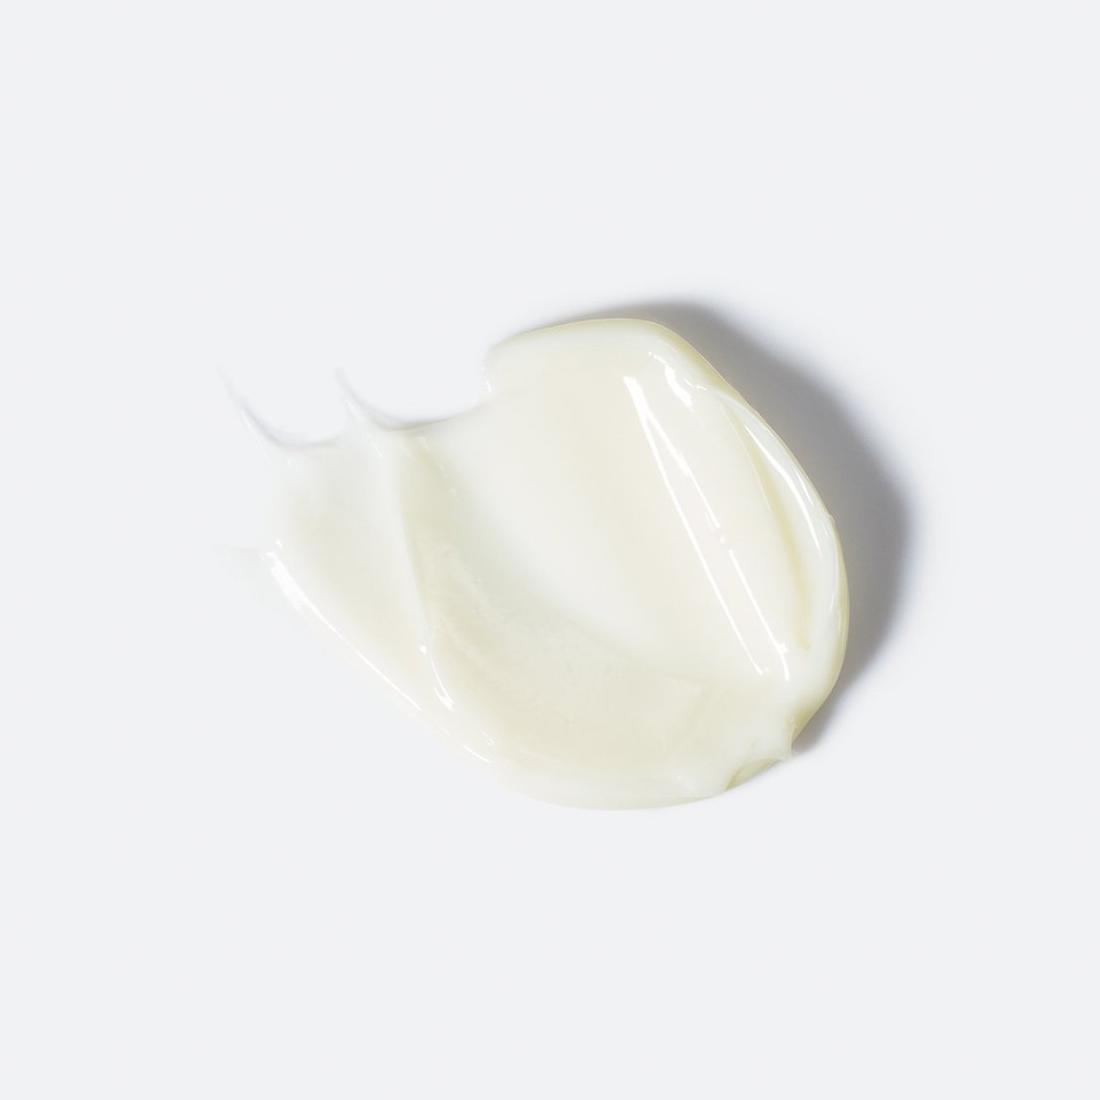 Mizon_Black_Snail_All_in_One_Cream_75mL-